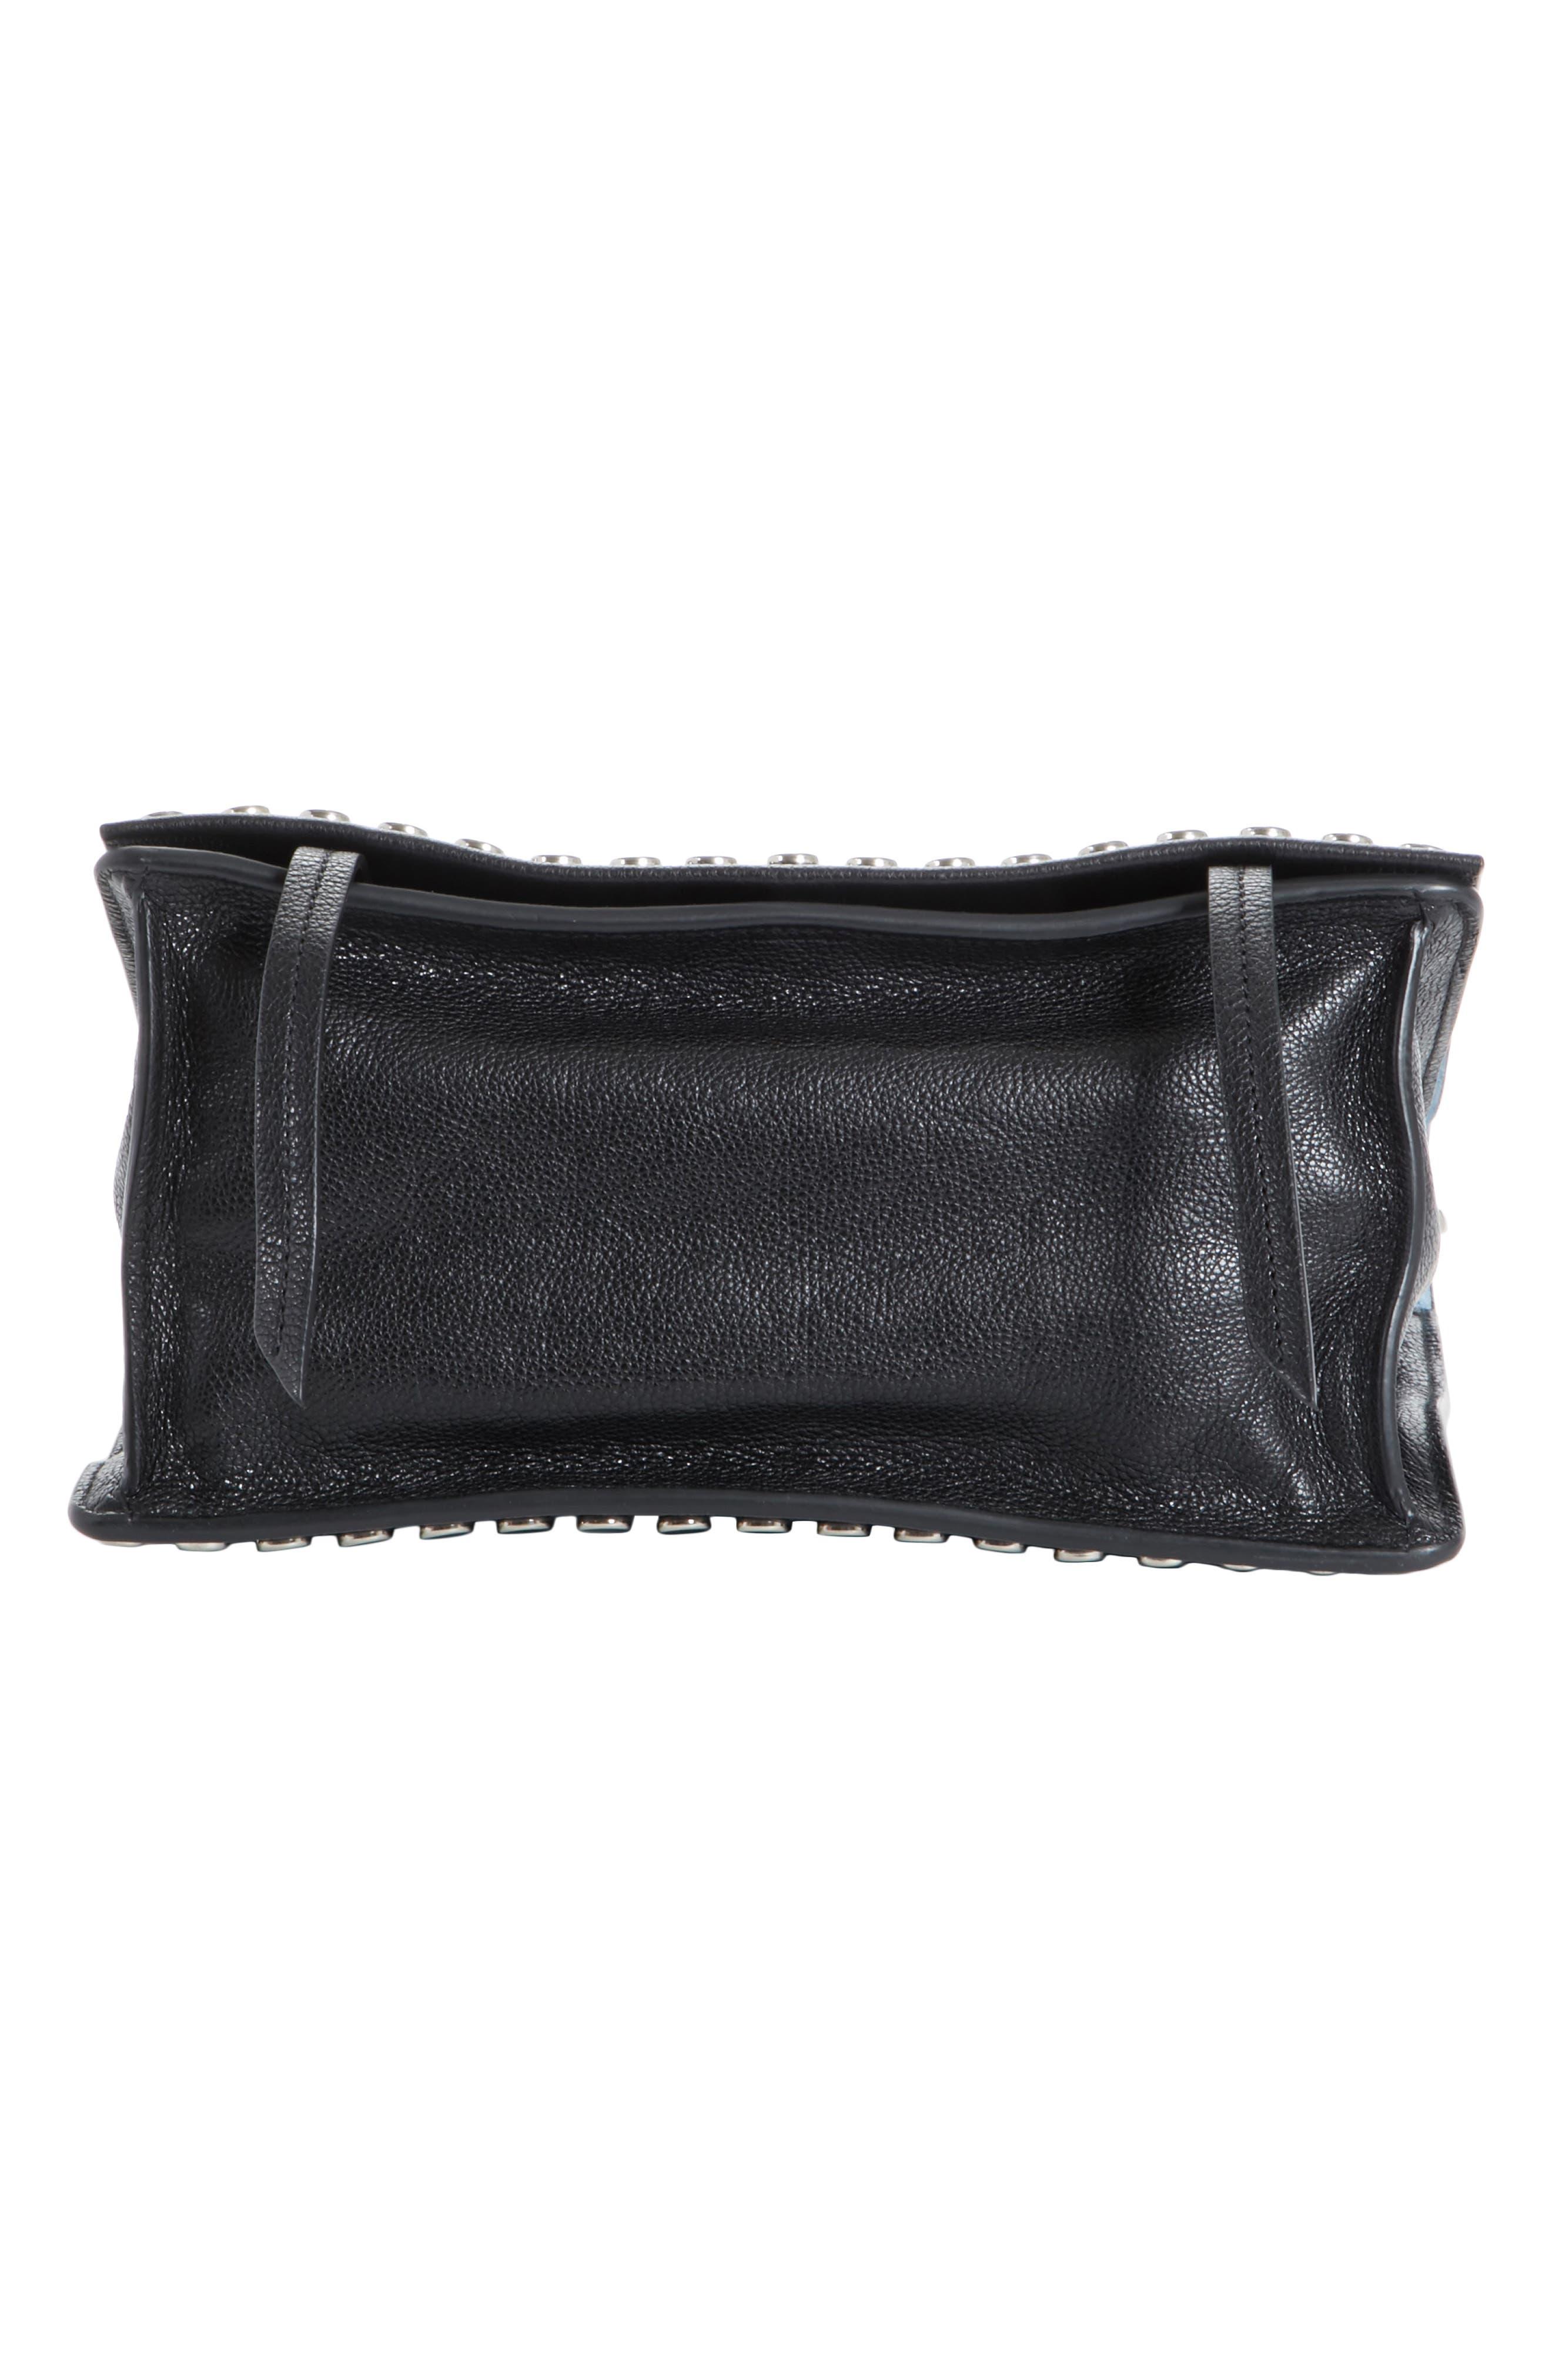 PRADA, Small Stud Etiquette Shoulder Bag, Alternate thumbnail 5, color, NERO/ ASTRALE